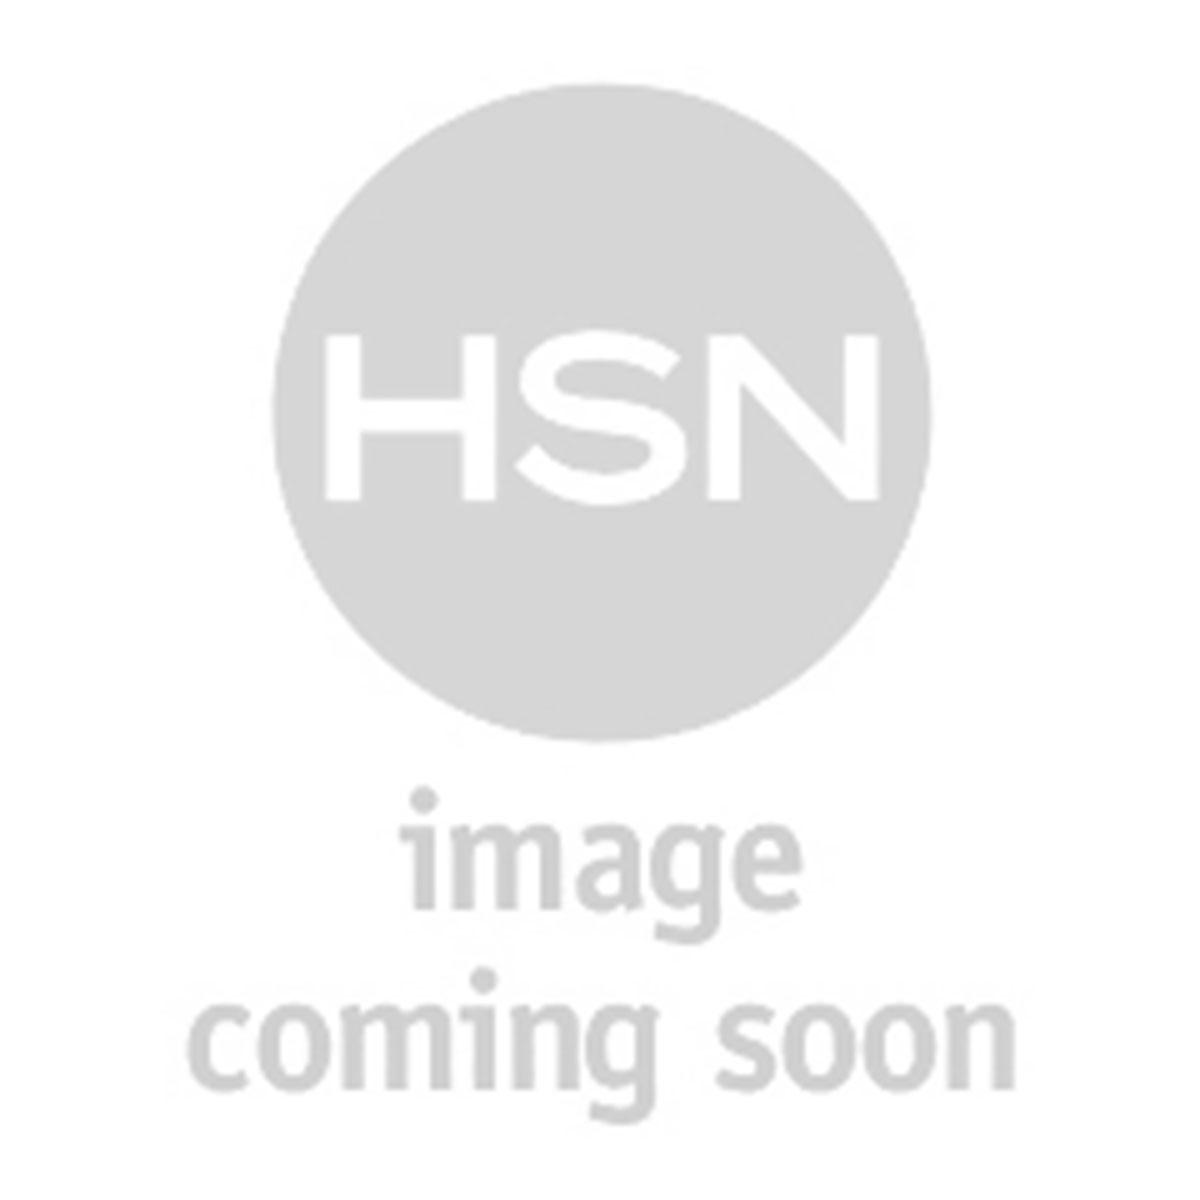 Benefit Dew the Hoola Liquid Bronzer for Face